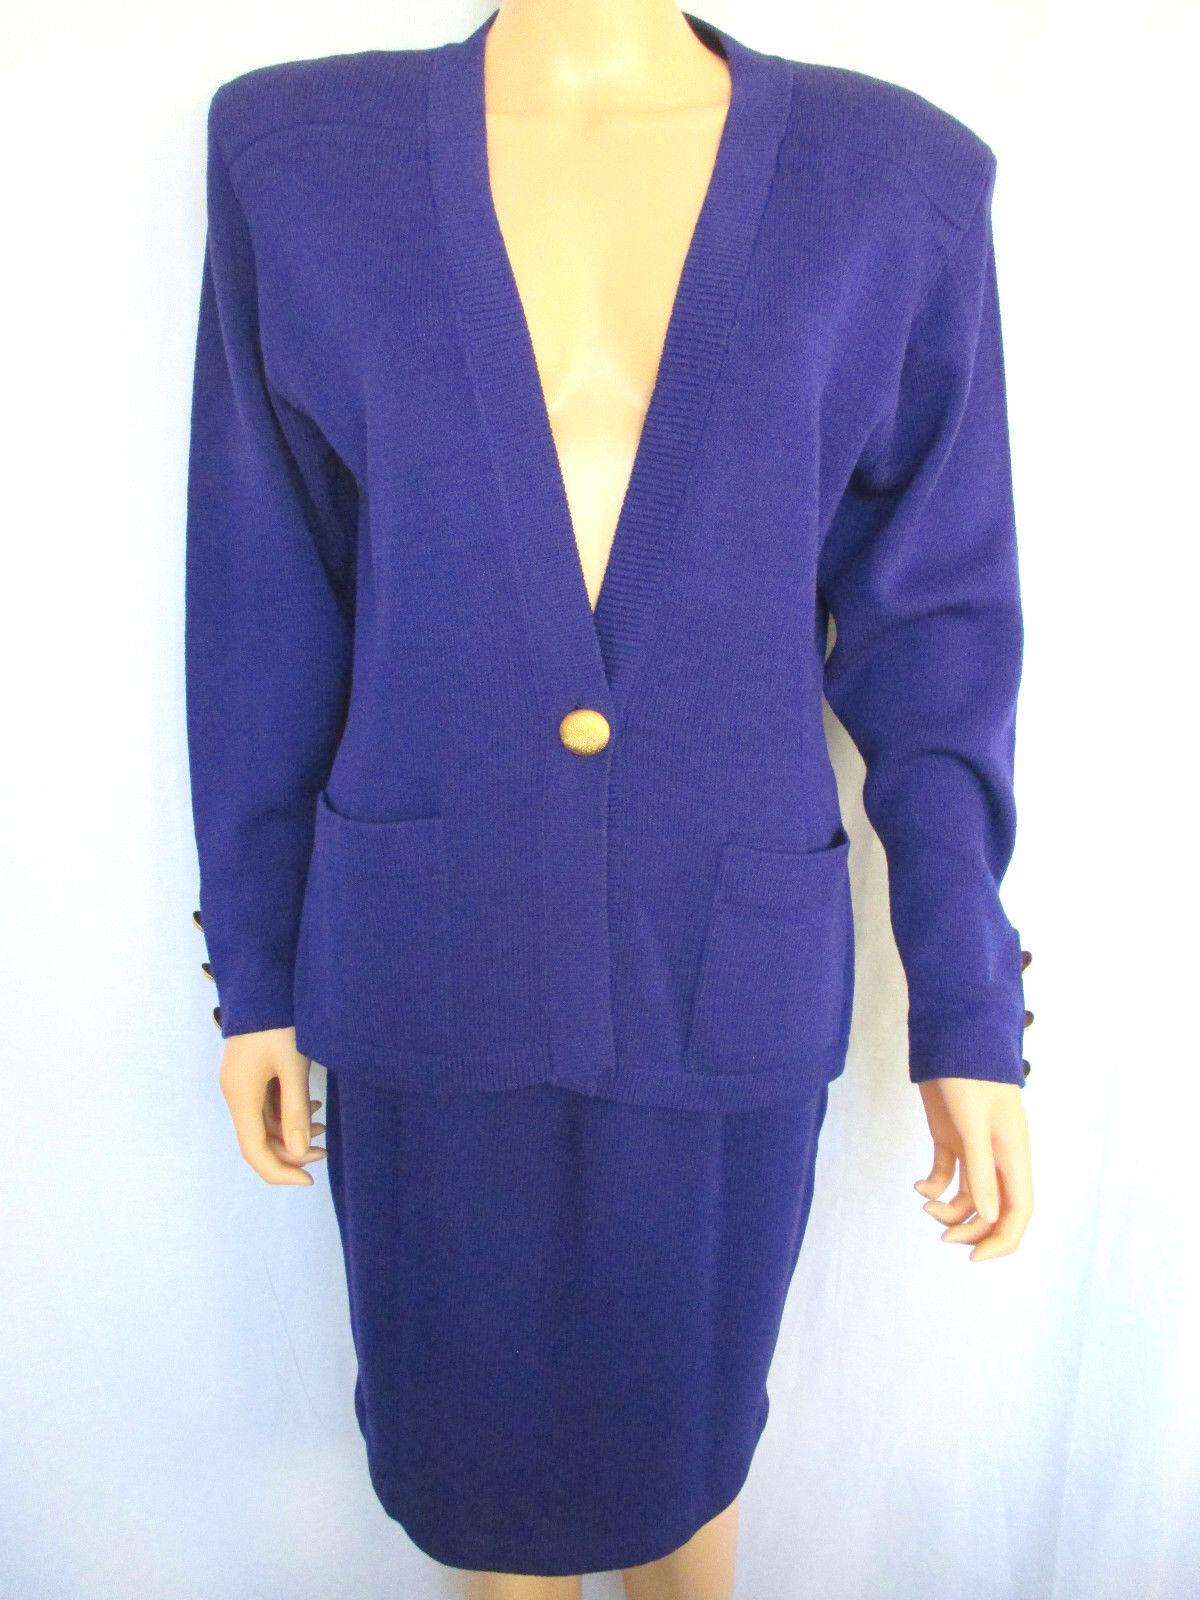 St. John Women's Sweater & Skirt Suit Set Purple Sweater Large Skirt Size 8